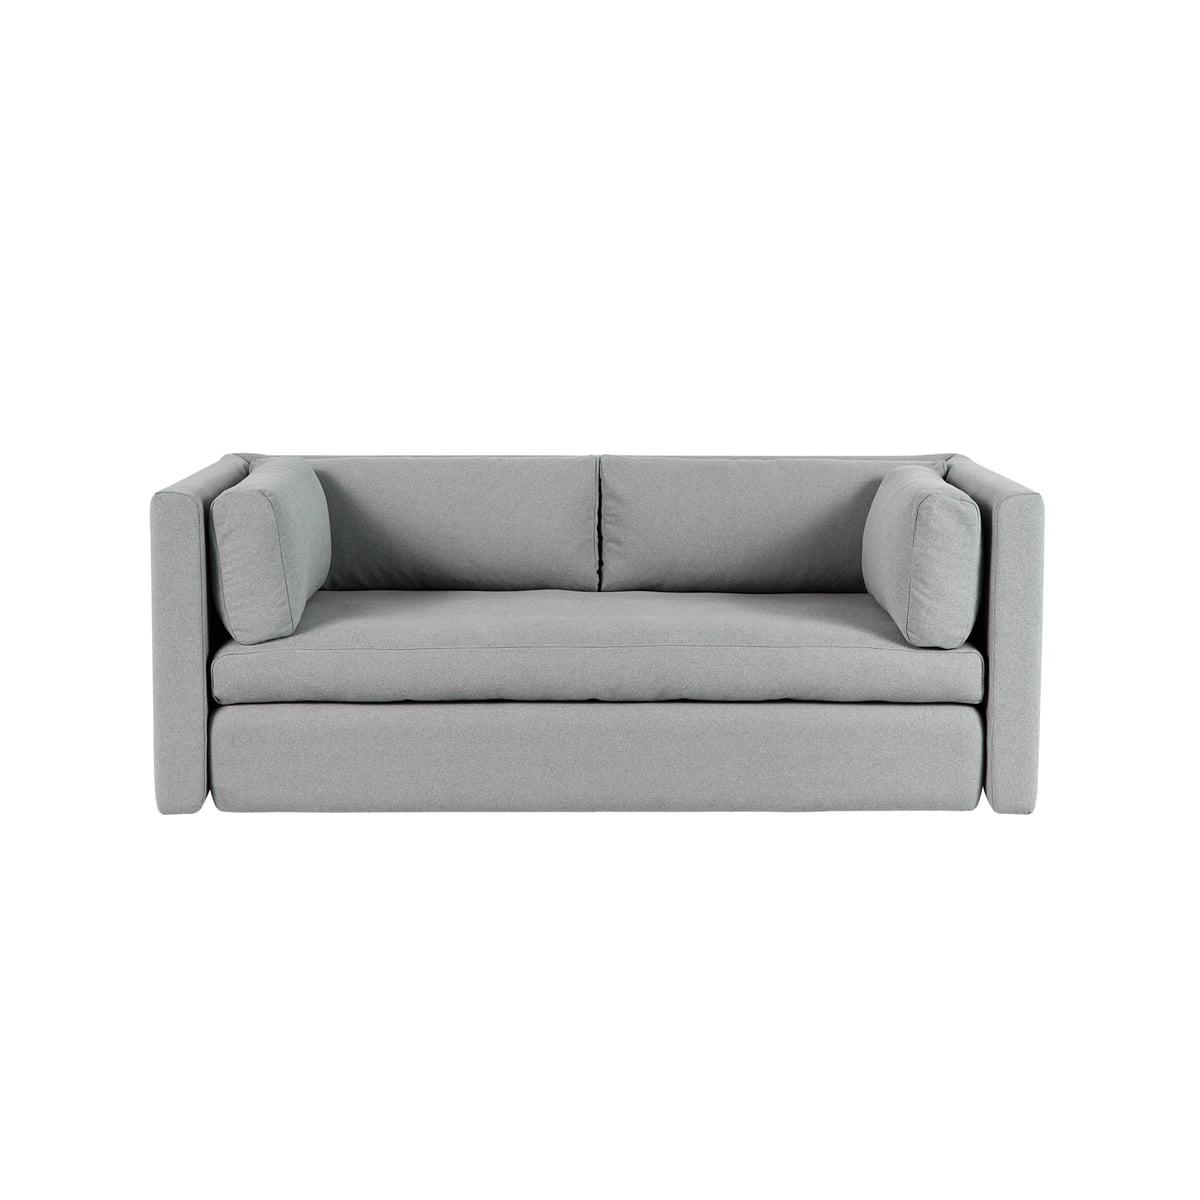 2 sitzer hackney sofa von hay kaufen. Black Bedroom Furniture Sets. Home Design Ideas